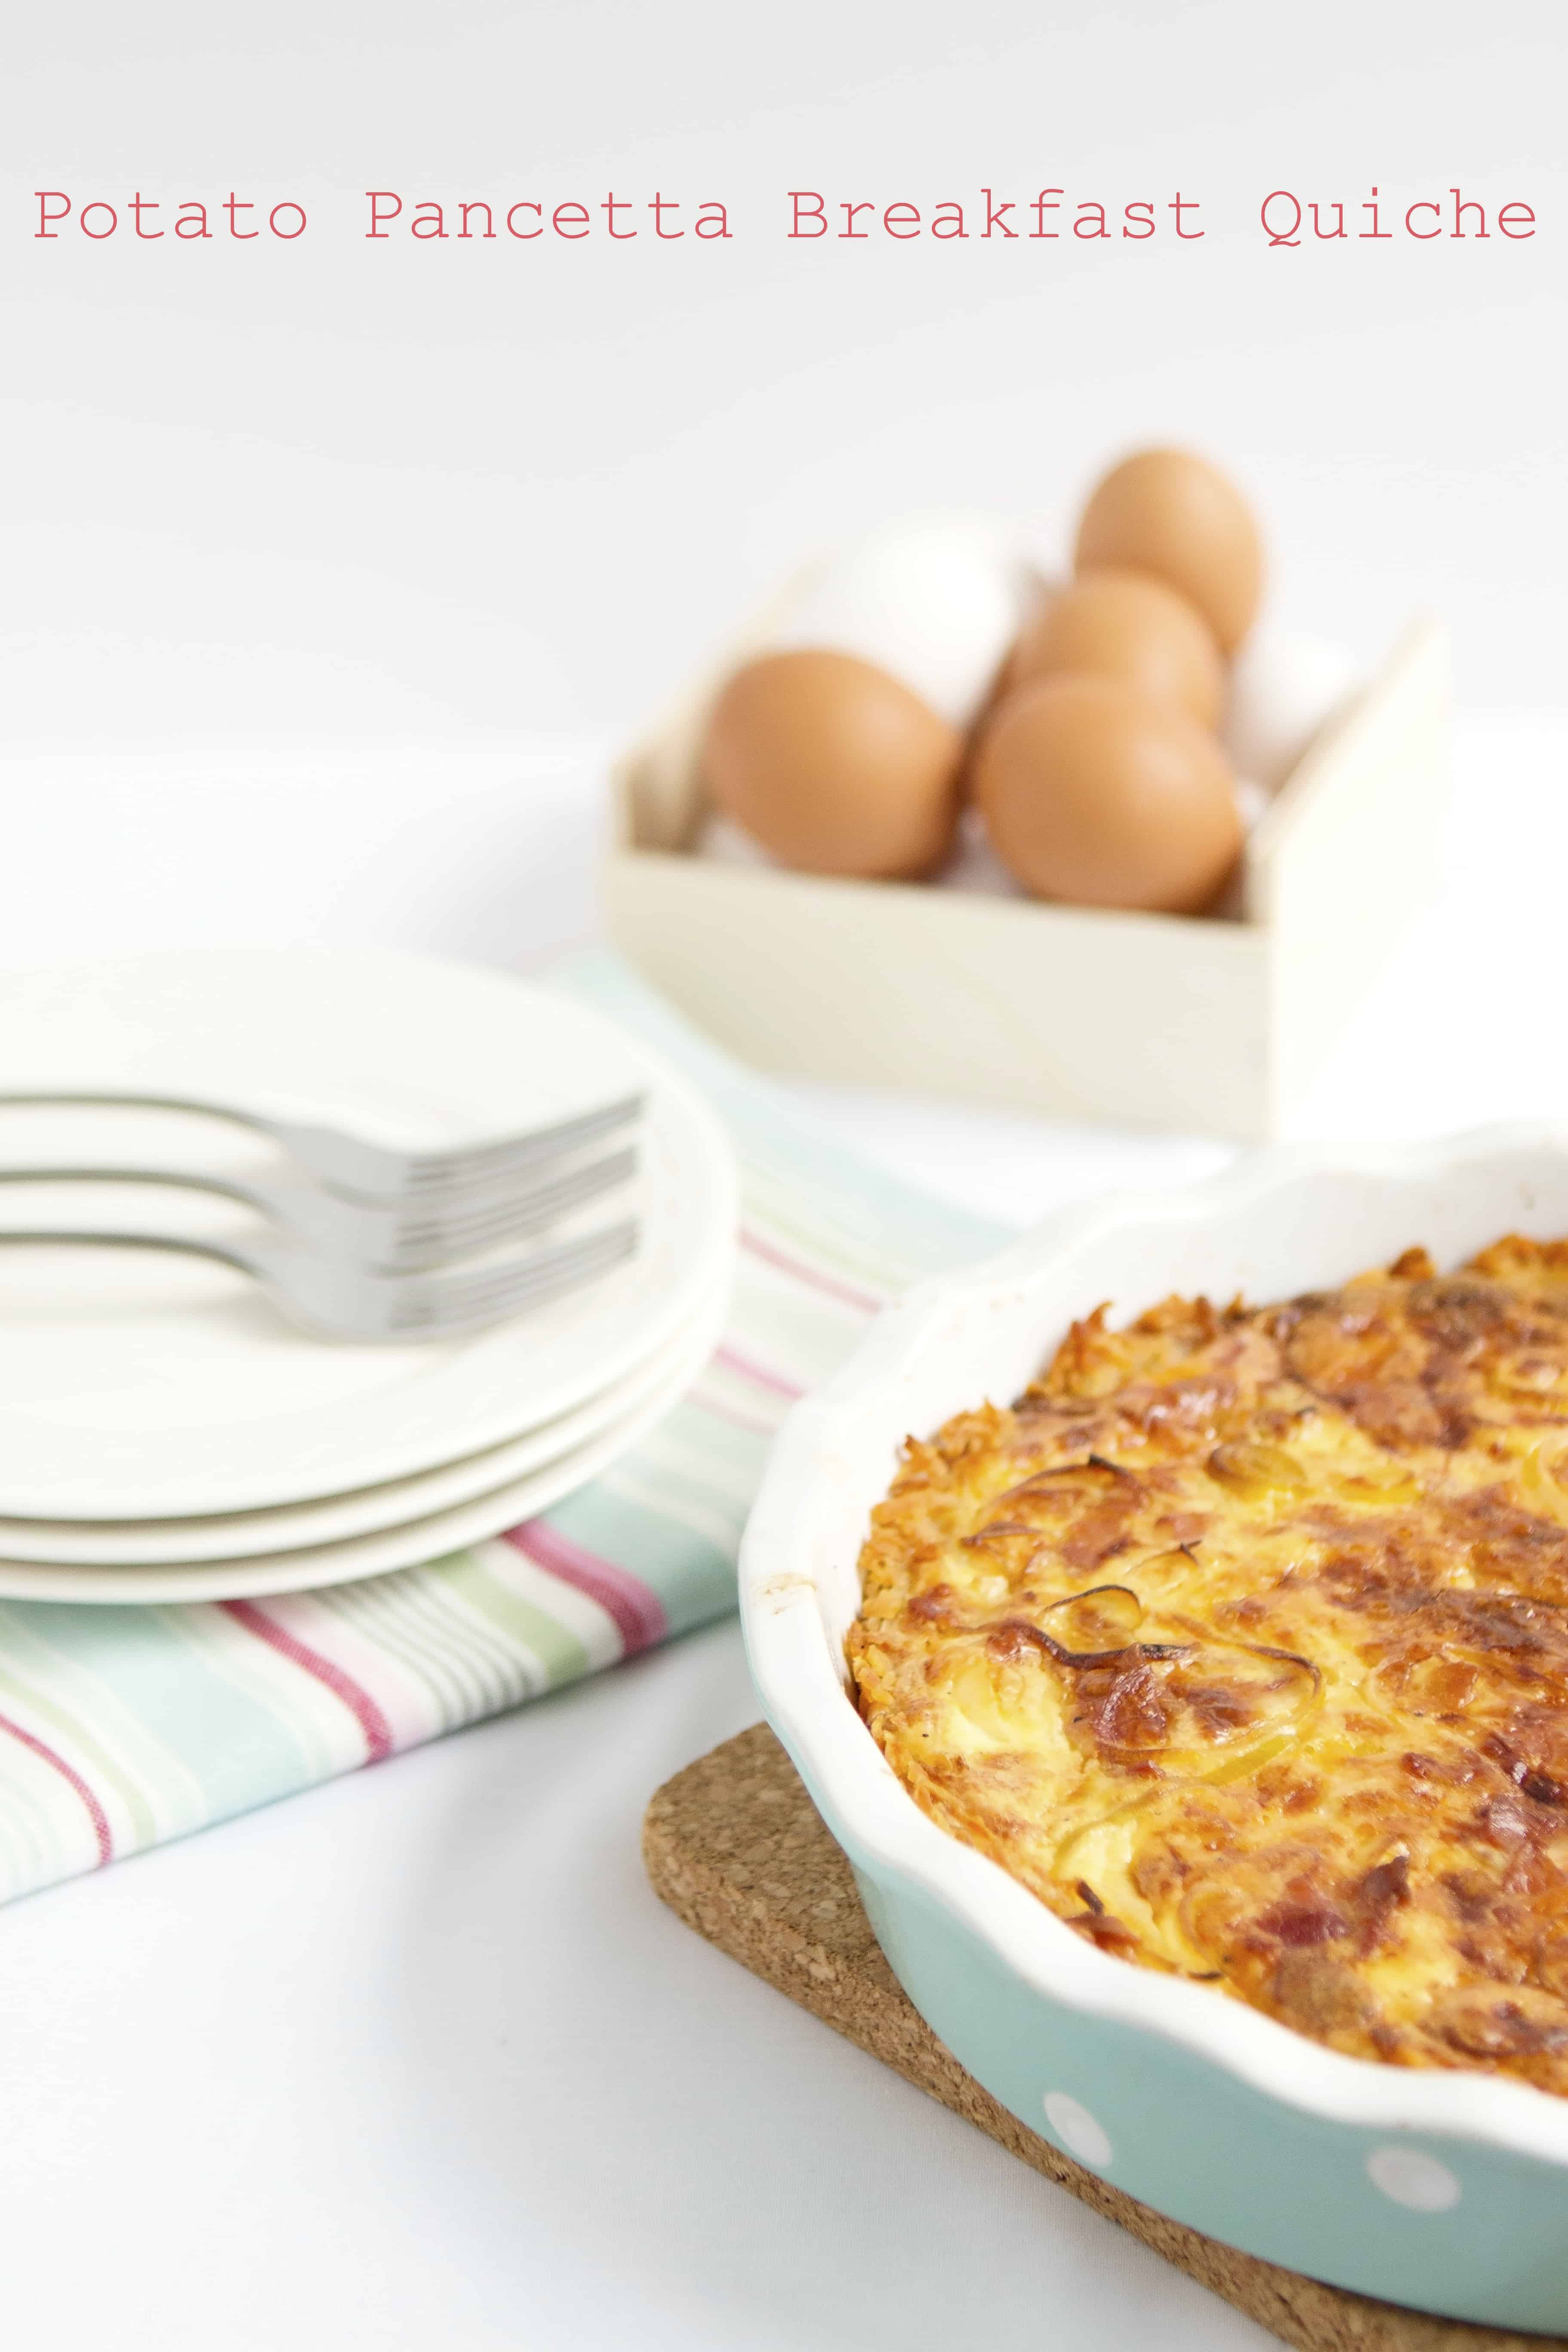 Potato Pancetta Breakfast Quiche